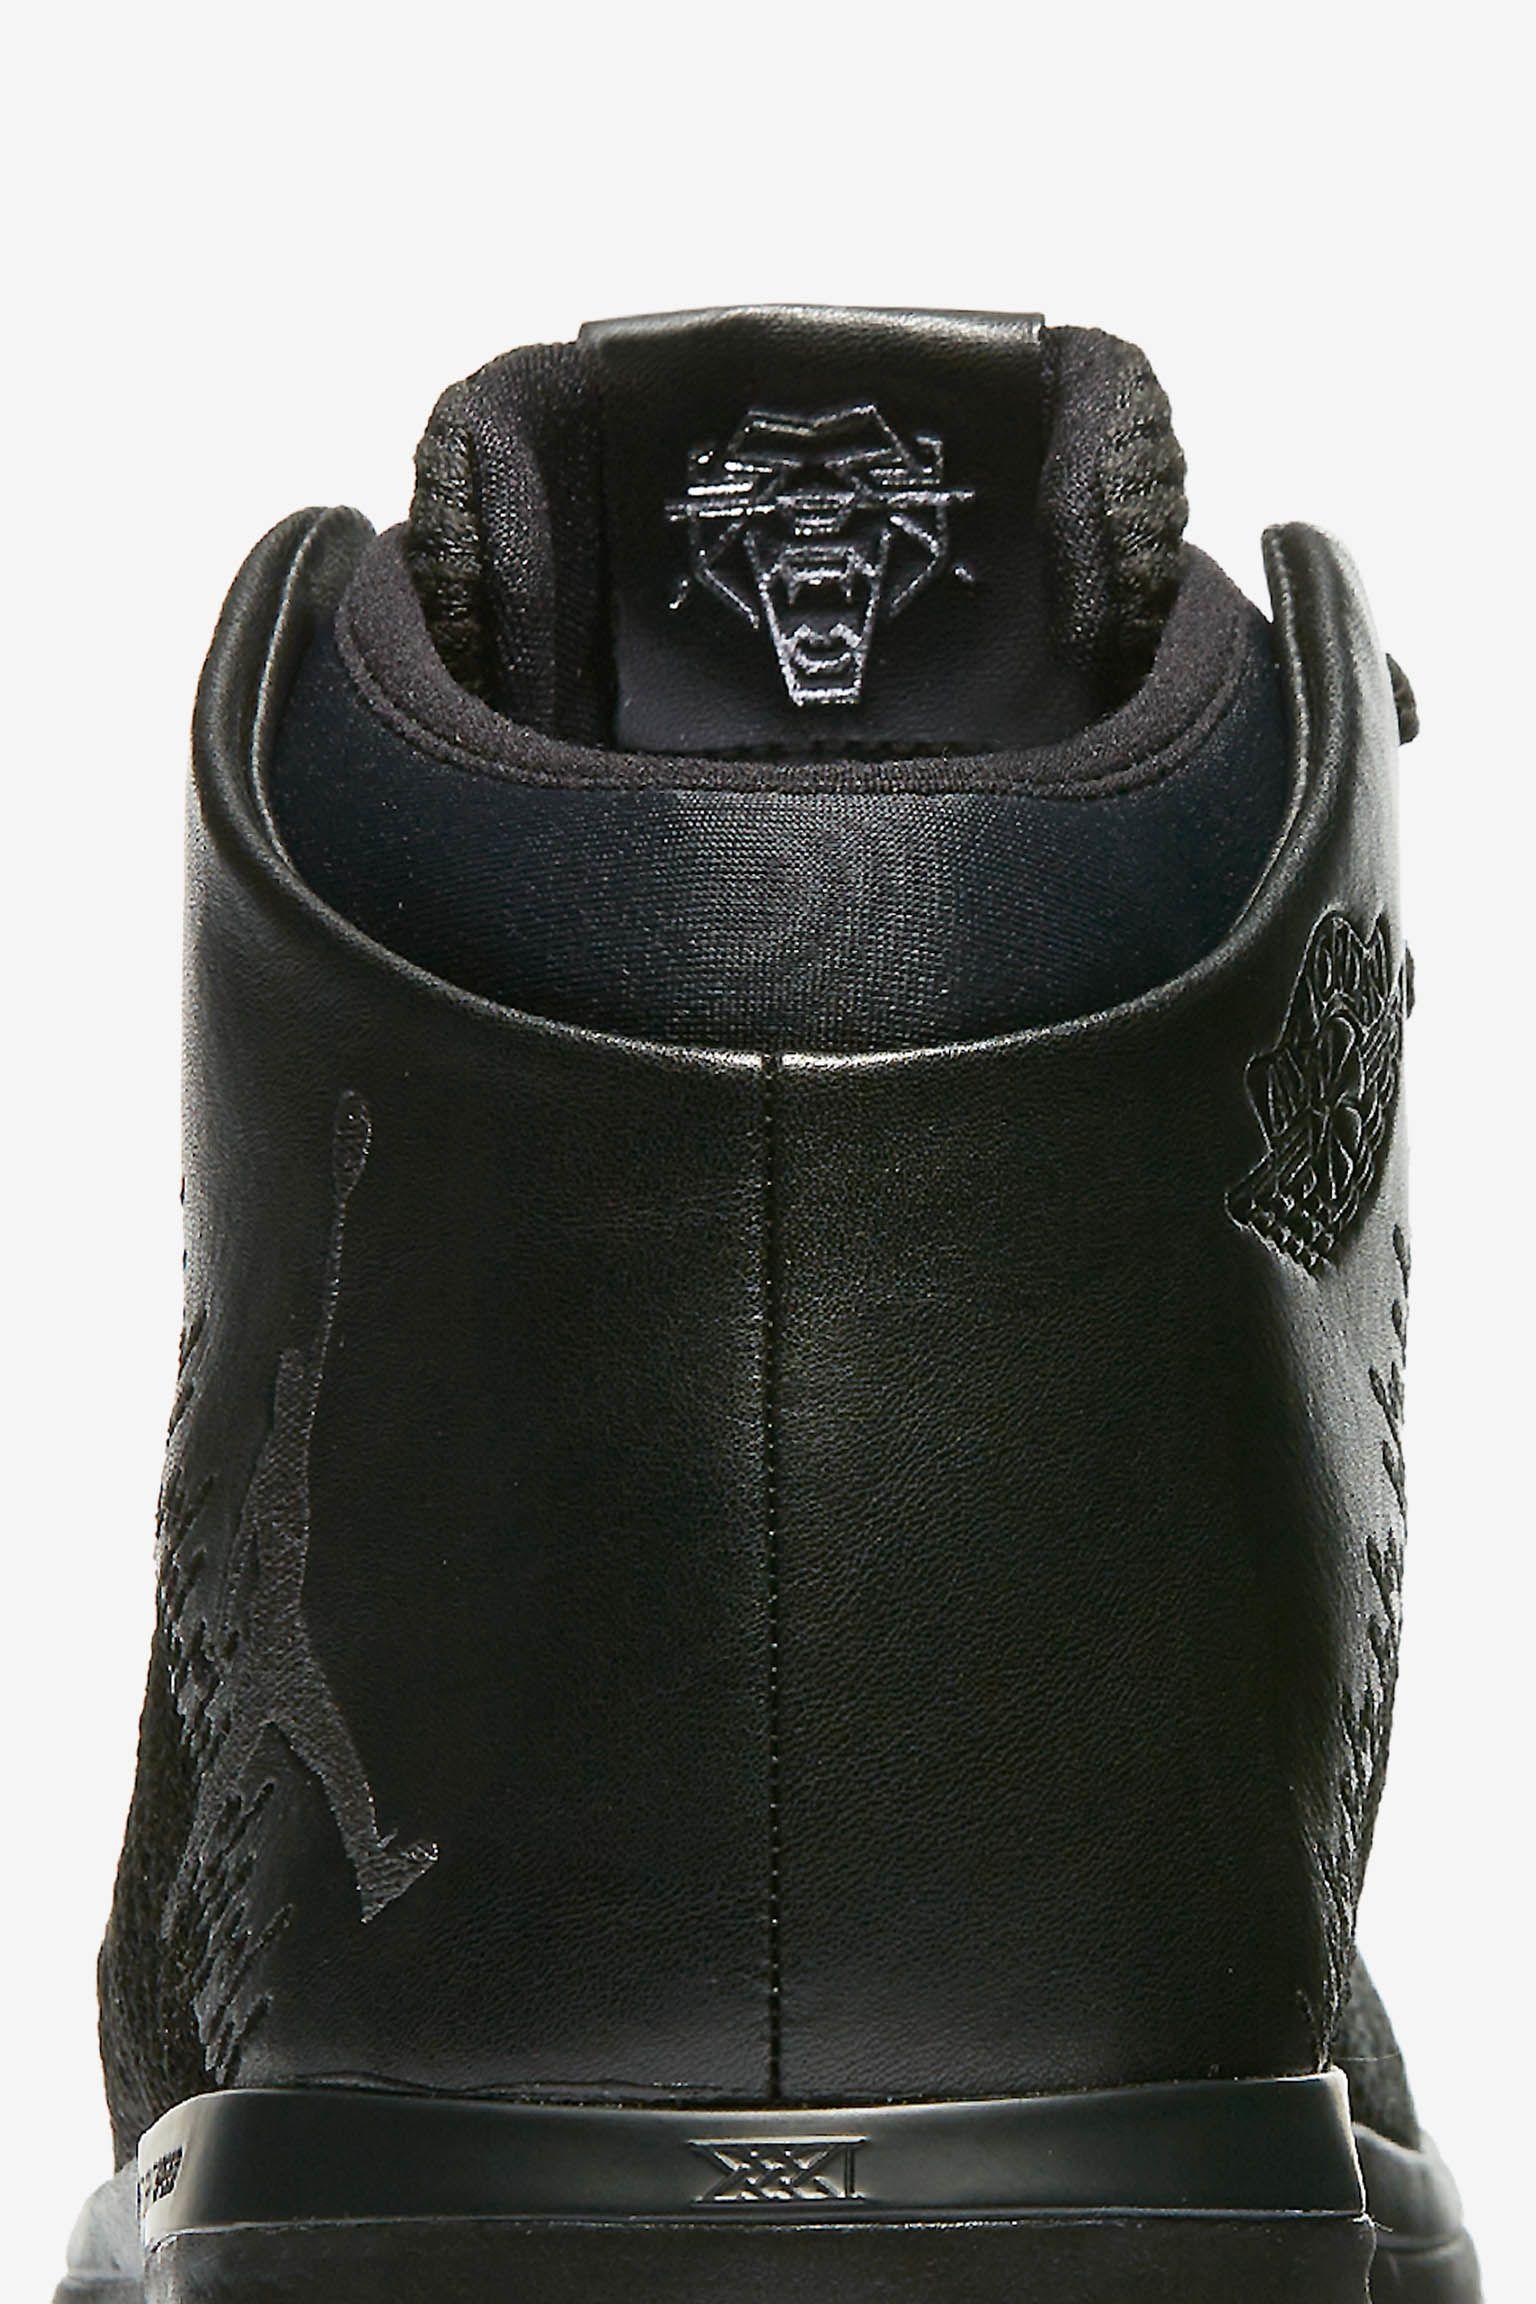 Air Jordan 31 'Black Cat'